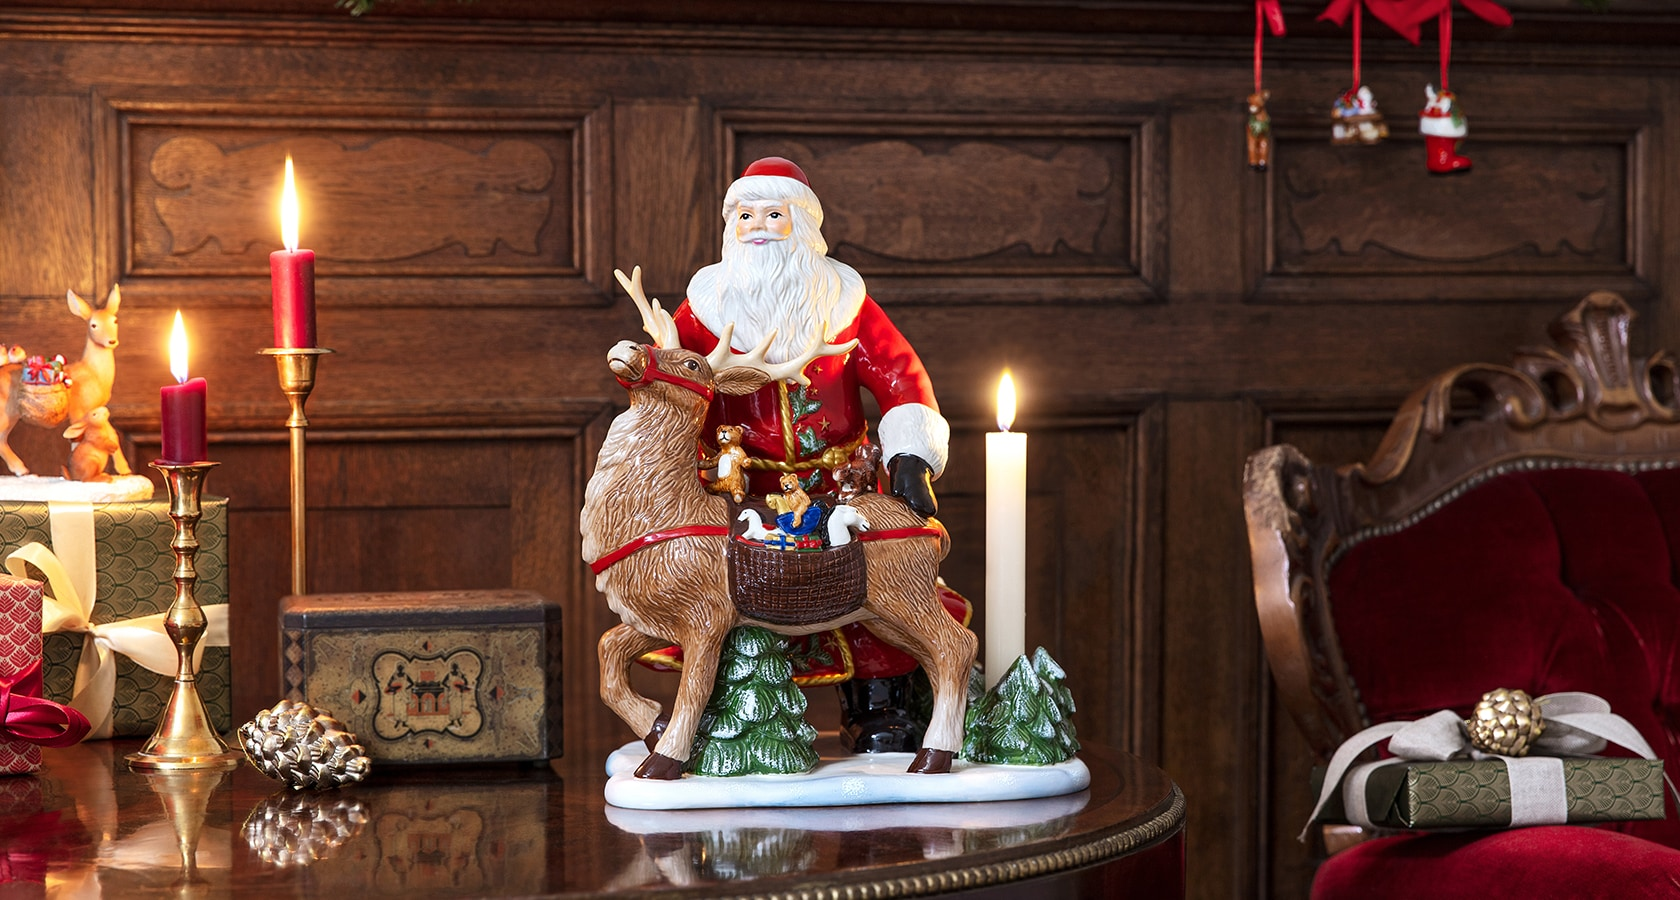 eu_plp_header_collection_christmas-toys-memory_default